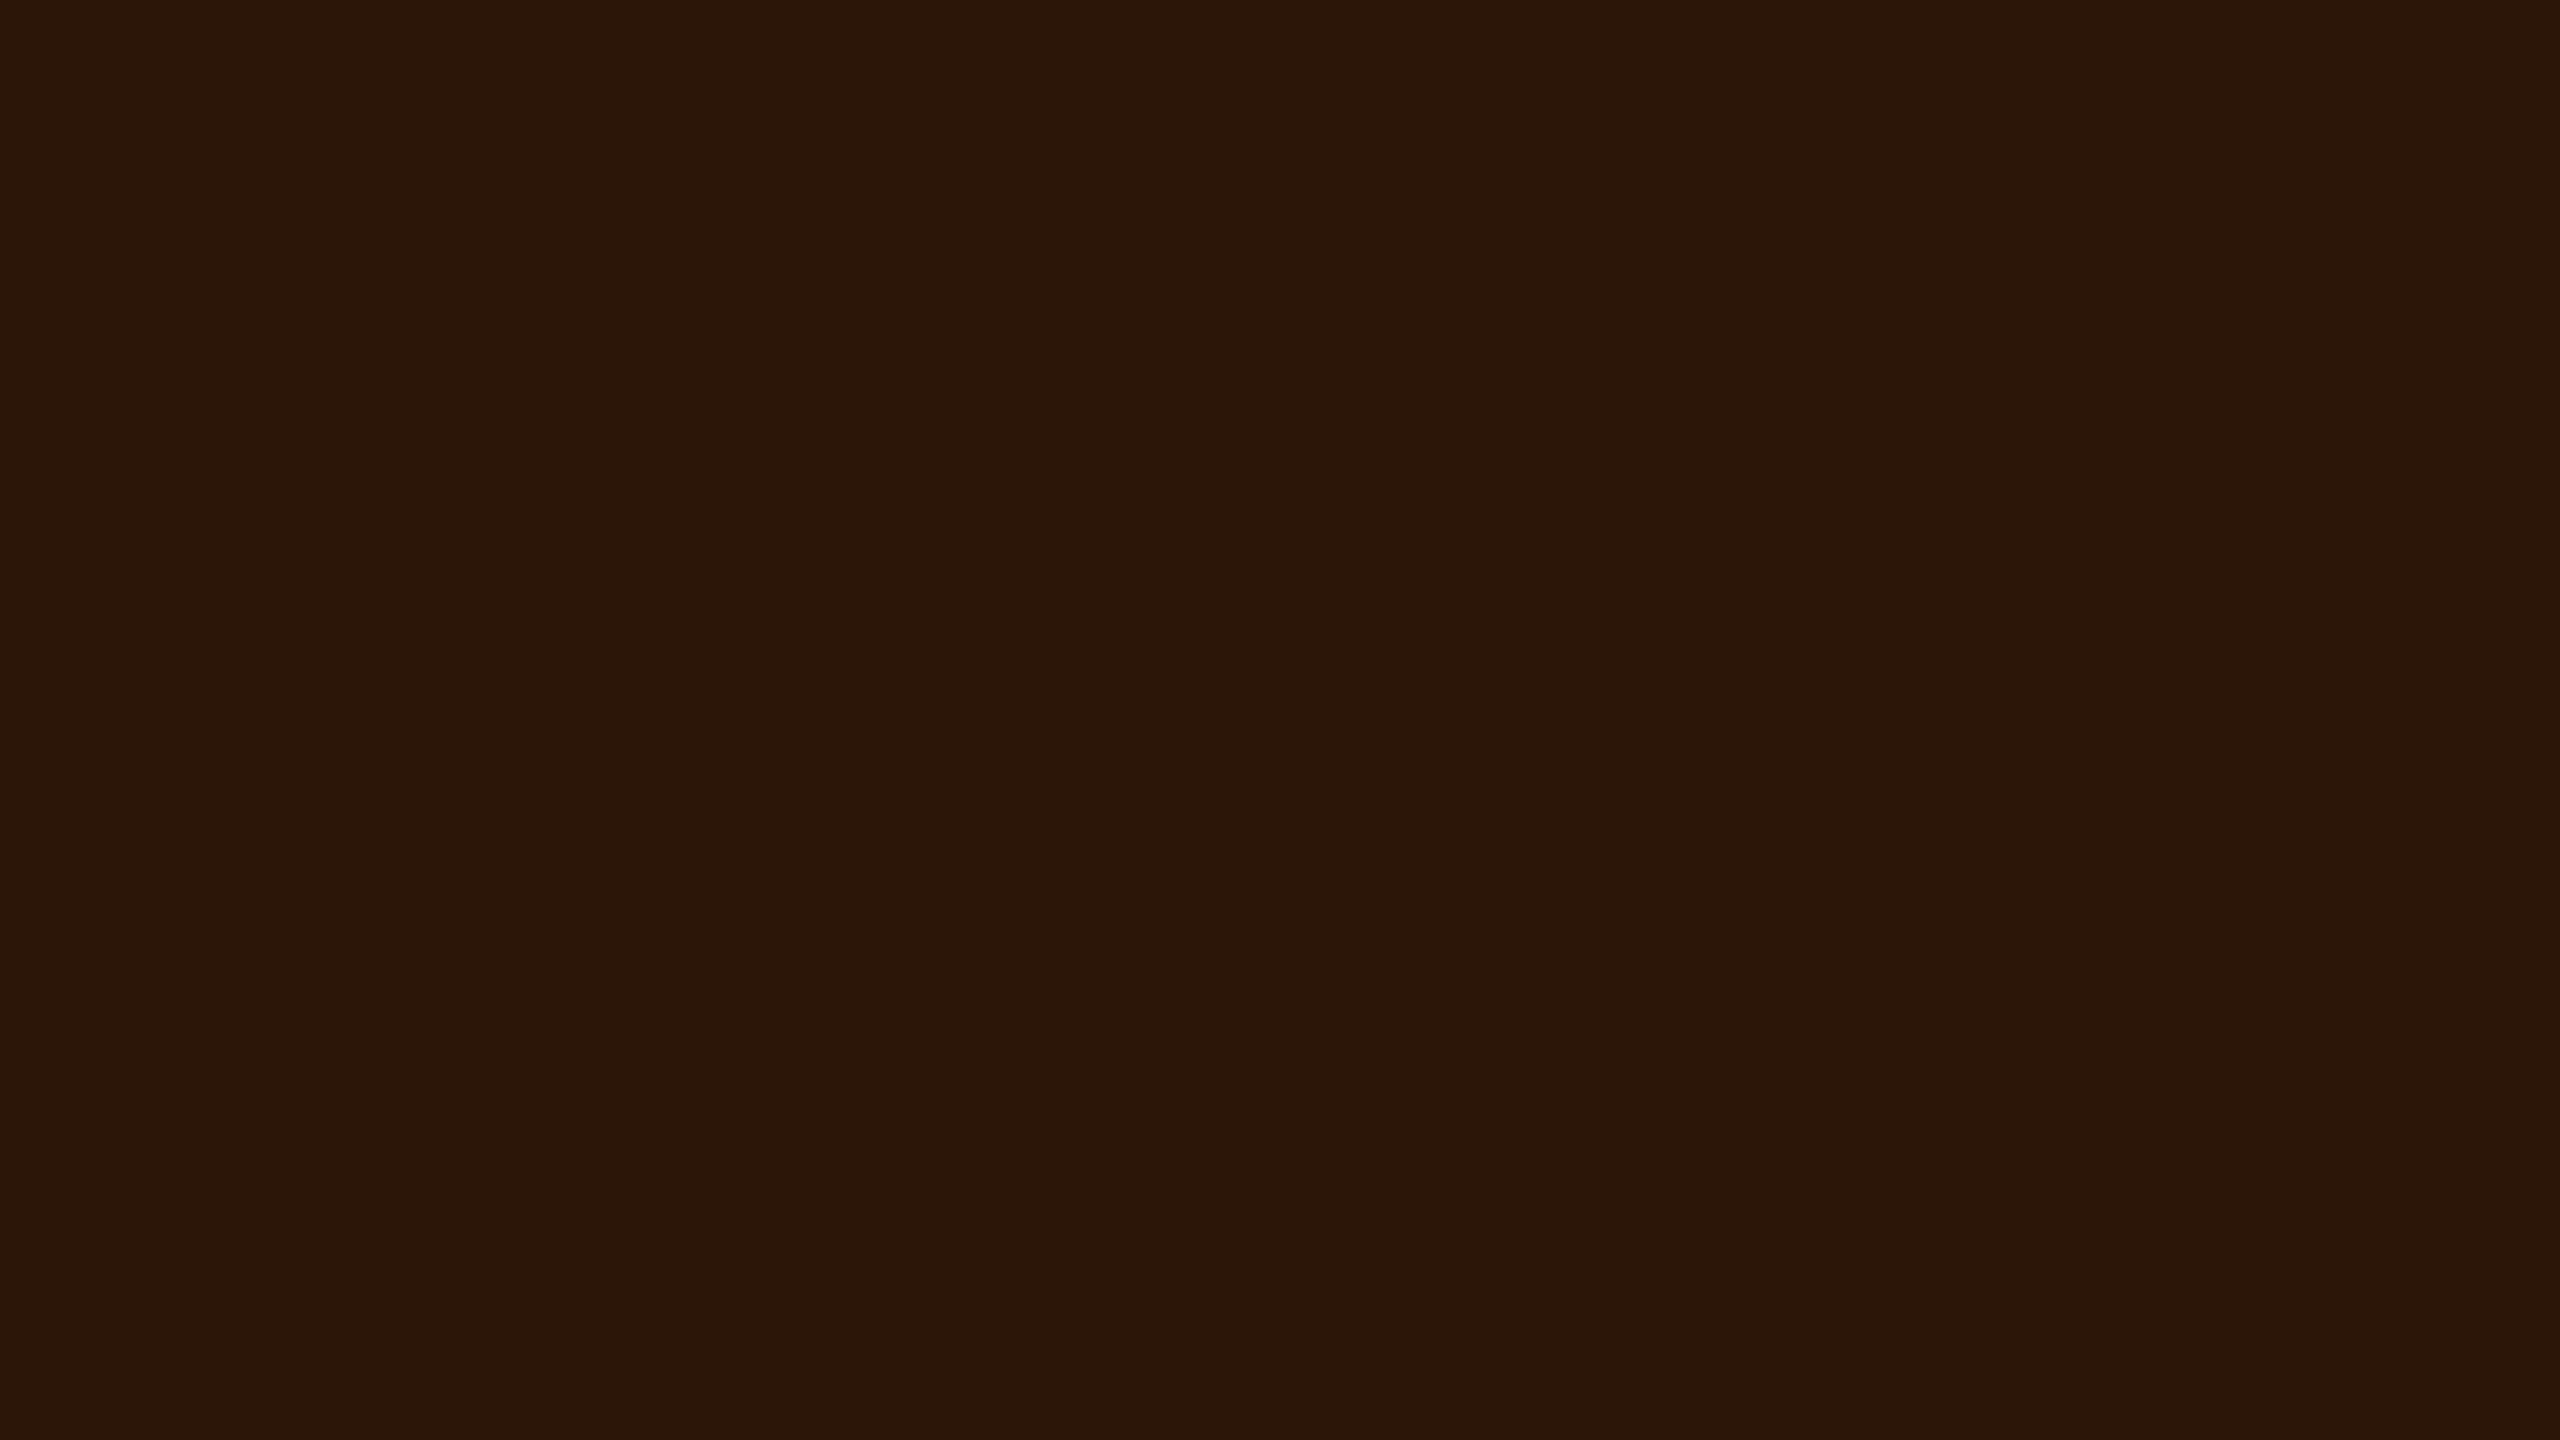 2560x1440 Zinnwaldite Brown Solid Color Background